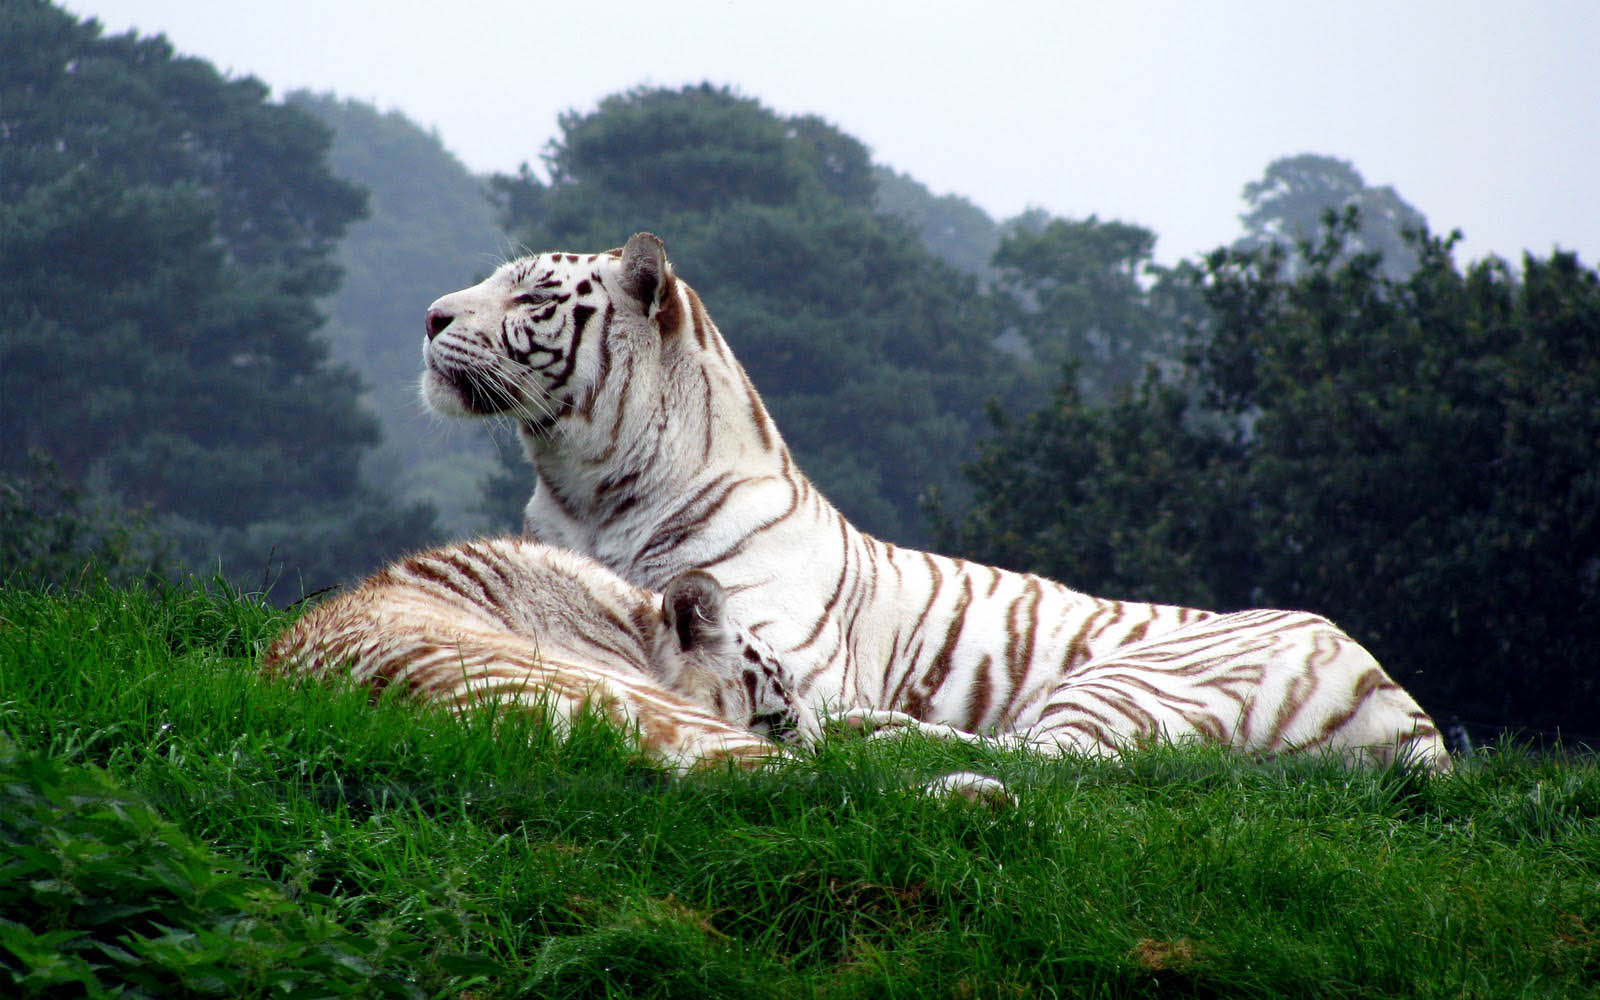 White+Tiger+Wallpapers+02 En Güzel HD Masaüstü Kaplan Resimleri